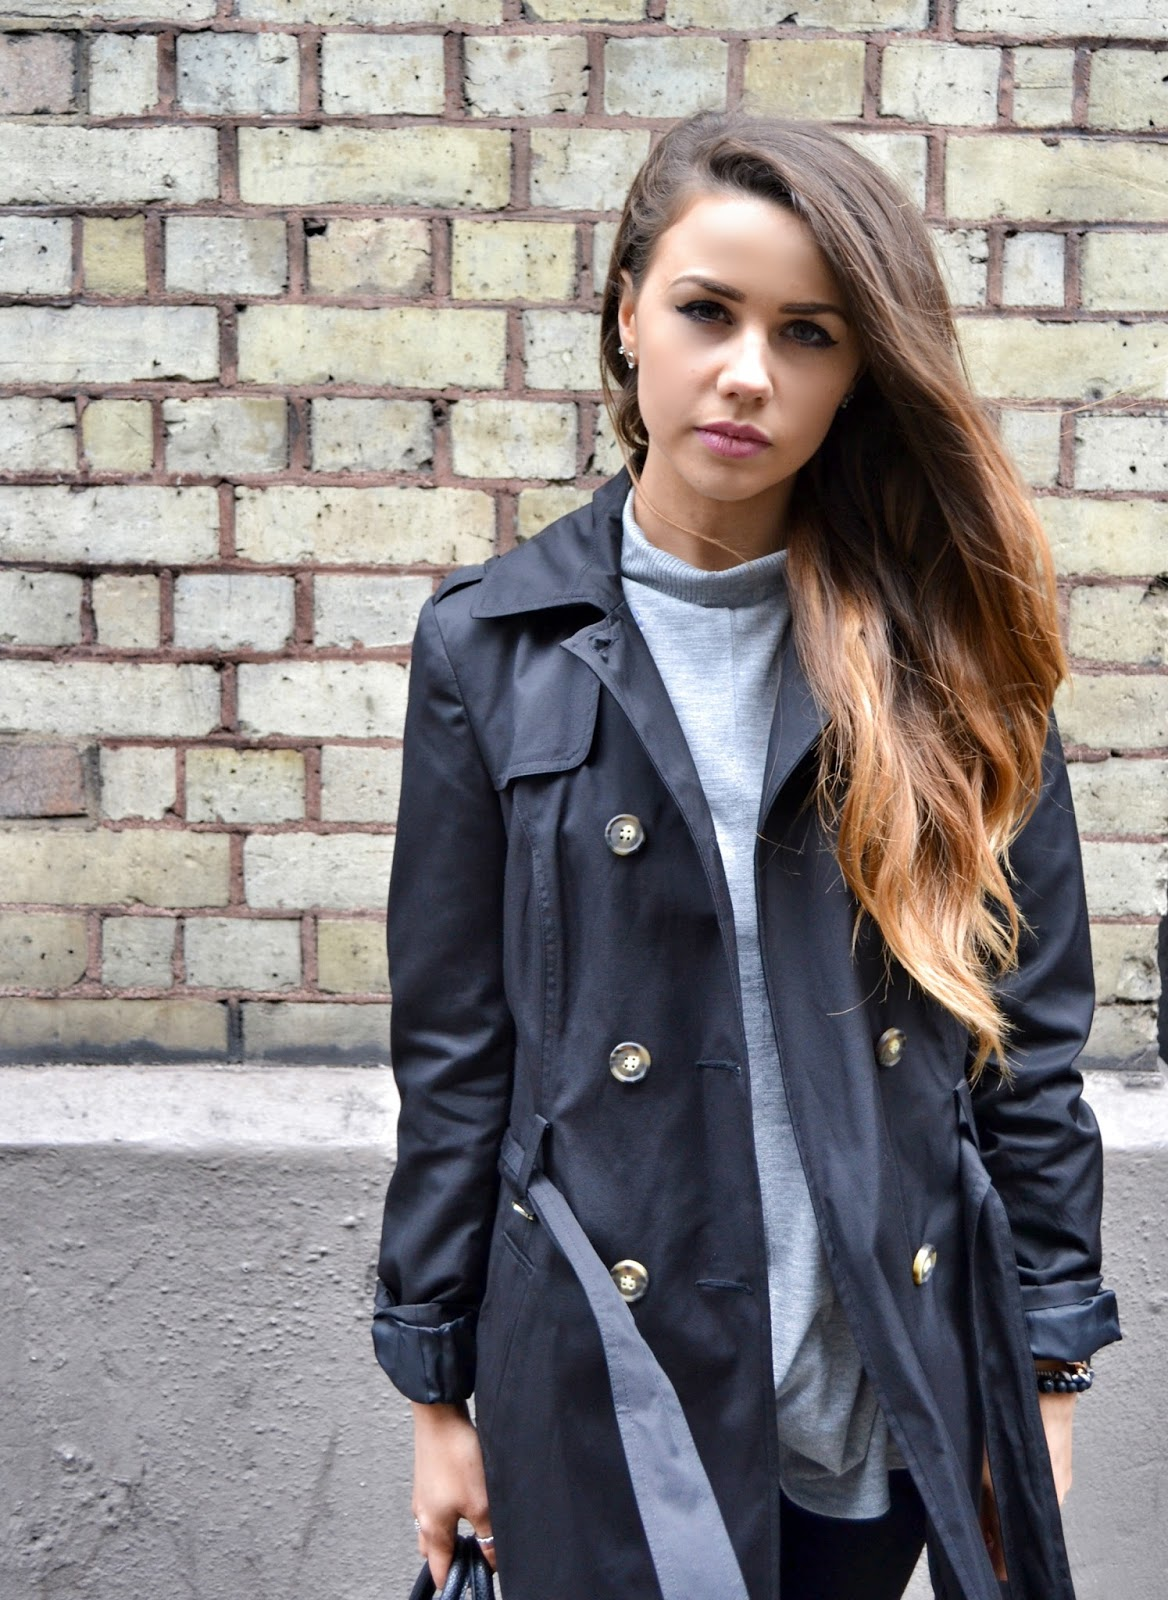 copper-garden-fashion-blogger-london-uk-monochrome